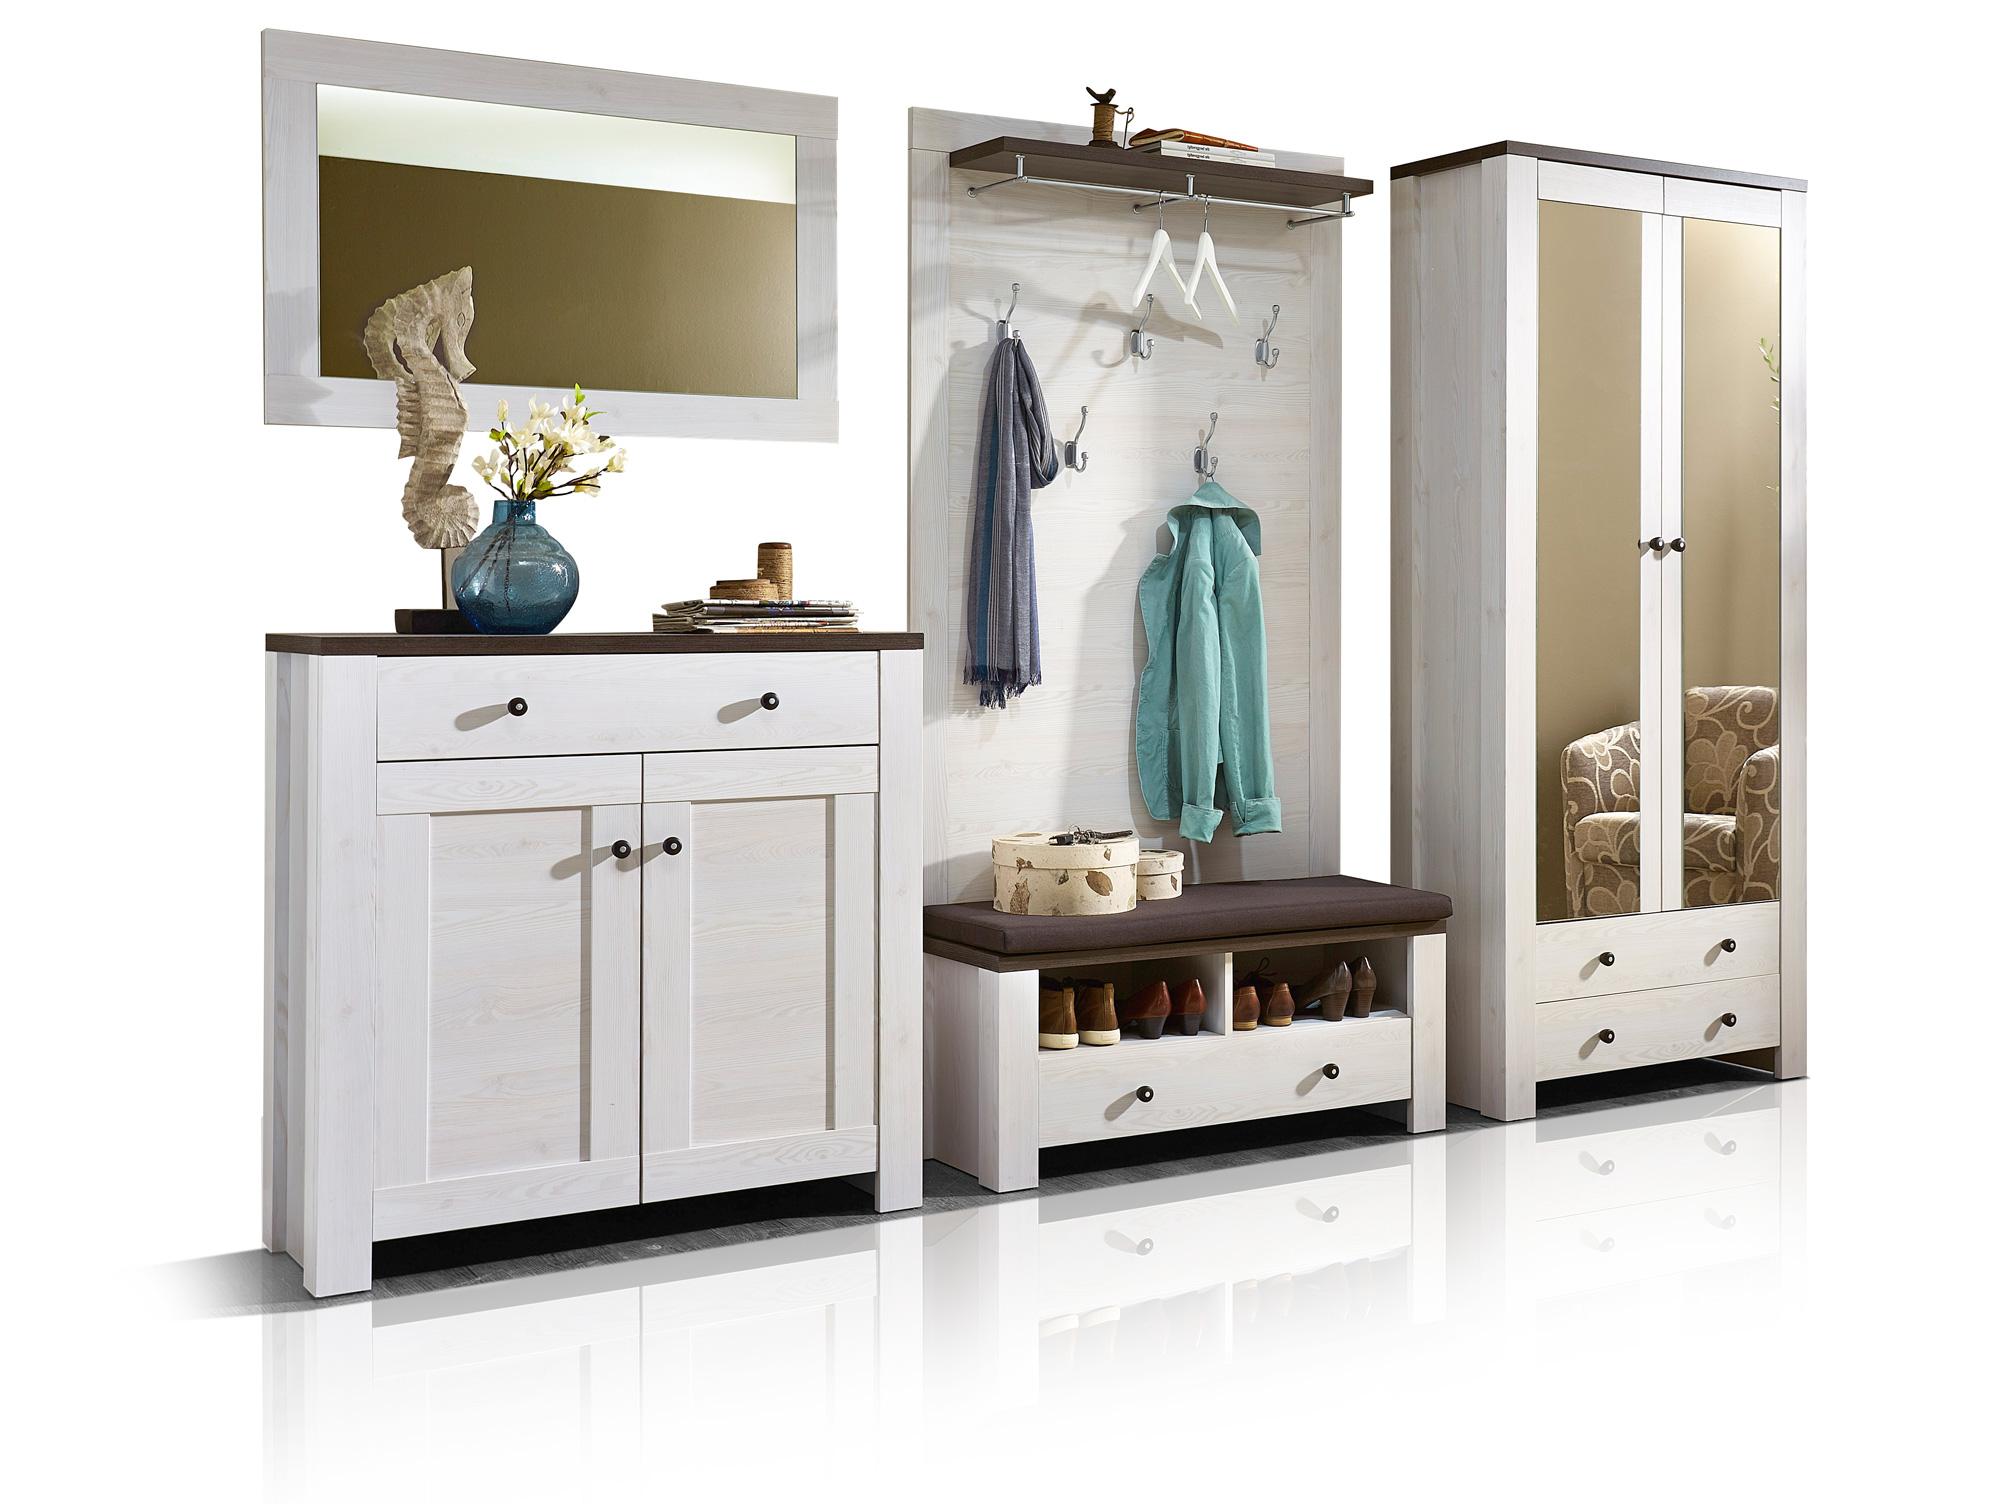 antwerpen garderobenset i l rche pinie dunkel. Black Bedroom Furniture Sets. Home Design Ideas